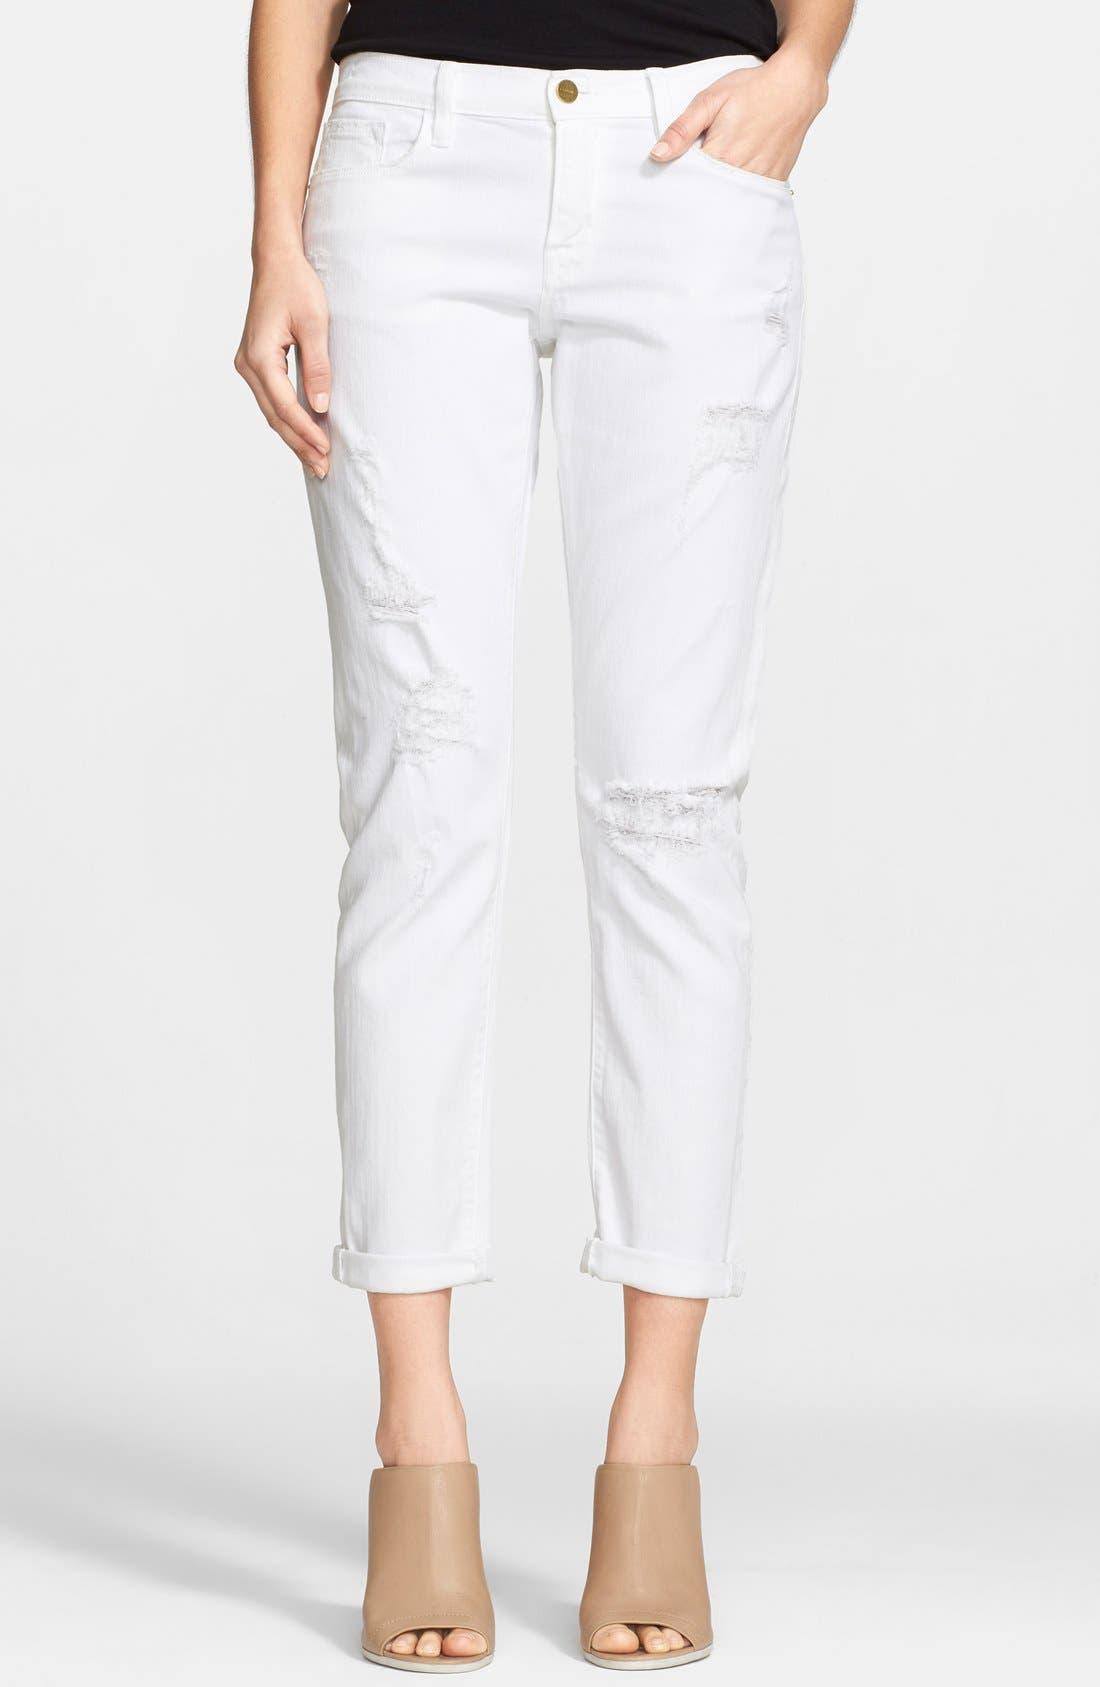 Main Image - Frame Denim 'Le Garcon' Destroyed Slim Boyfriend Jeans (Rip Blanc)